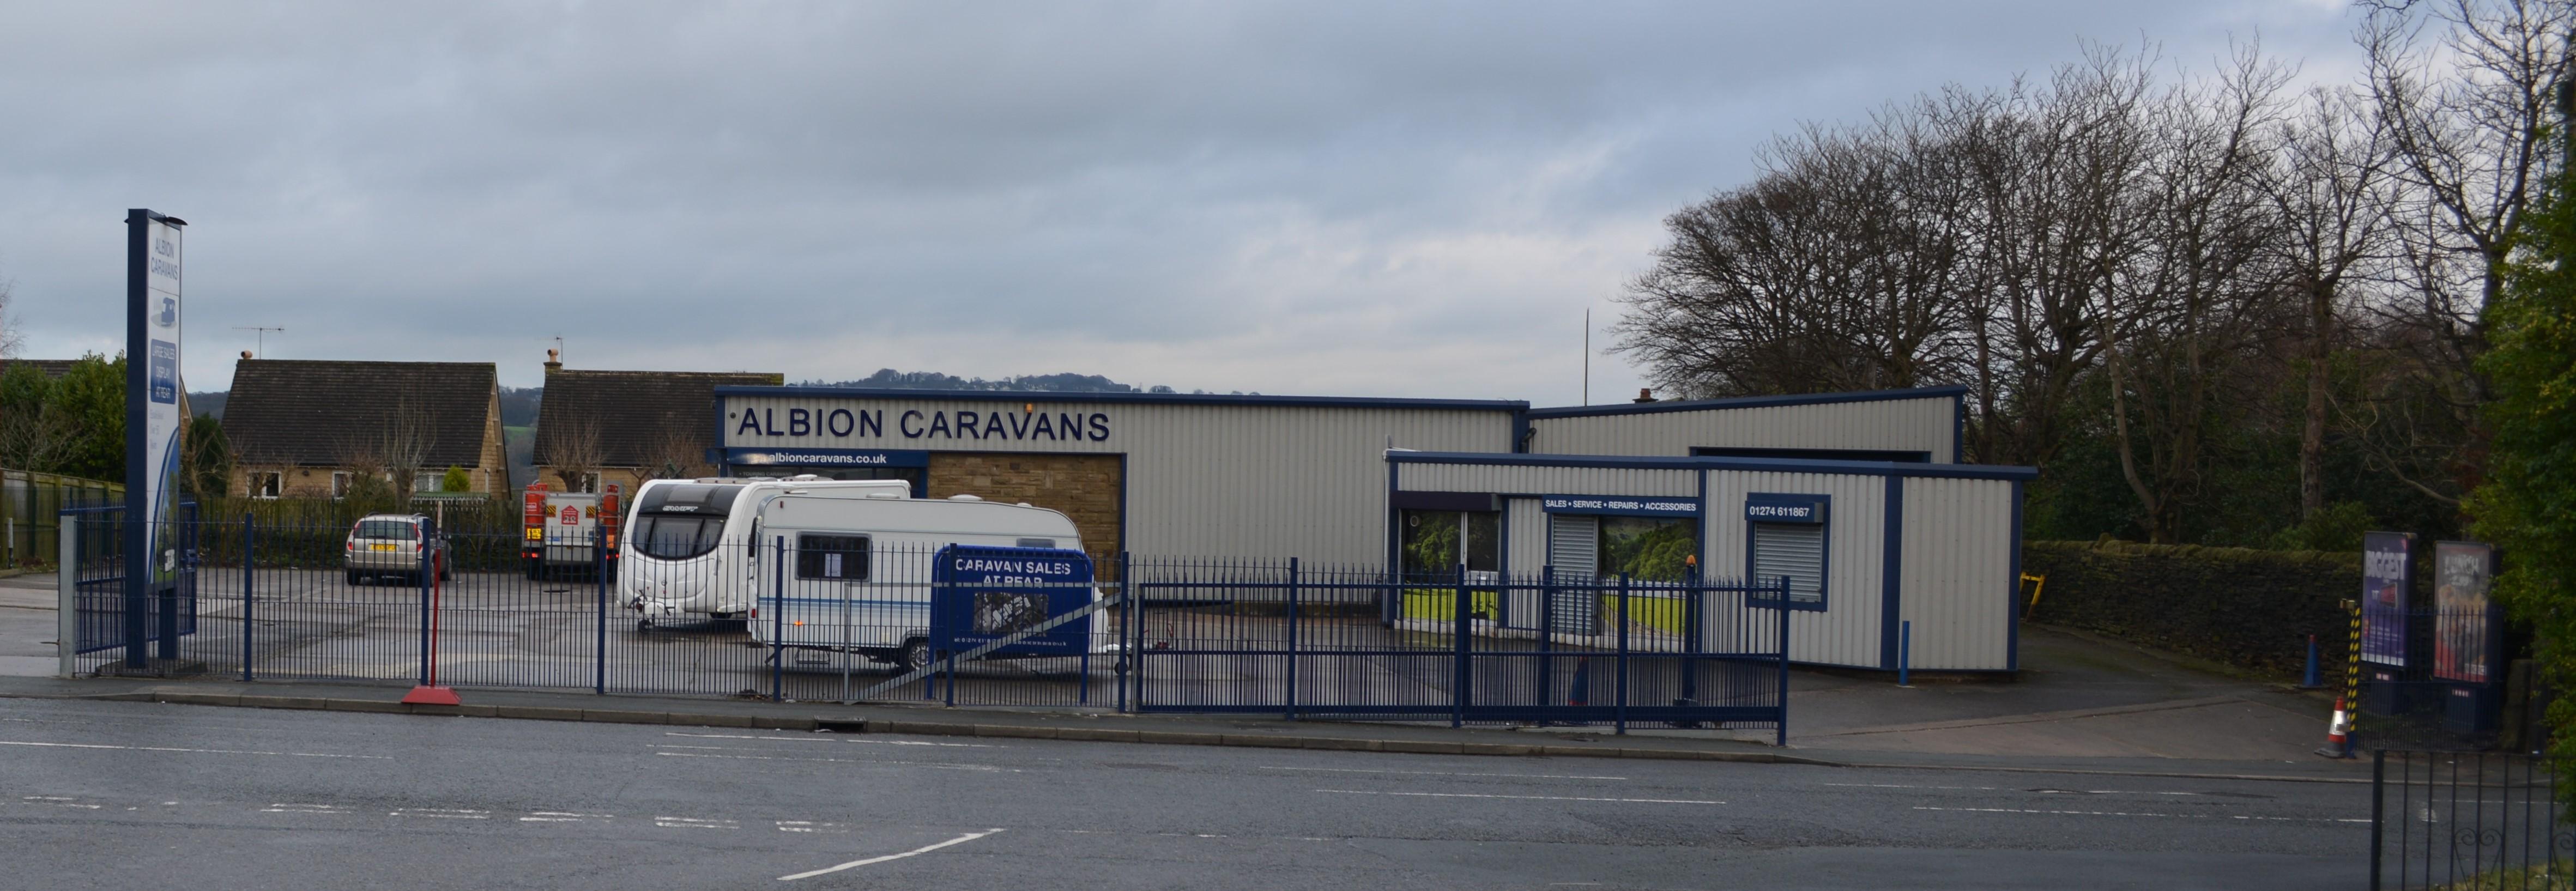 caravans in Yorkshire